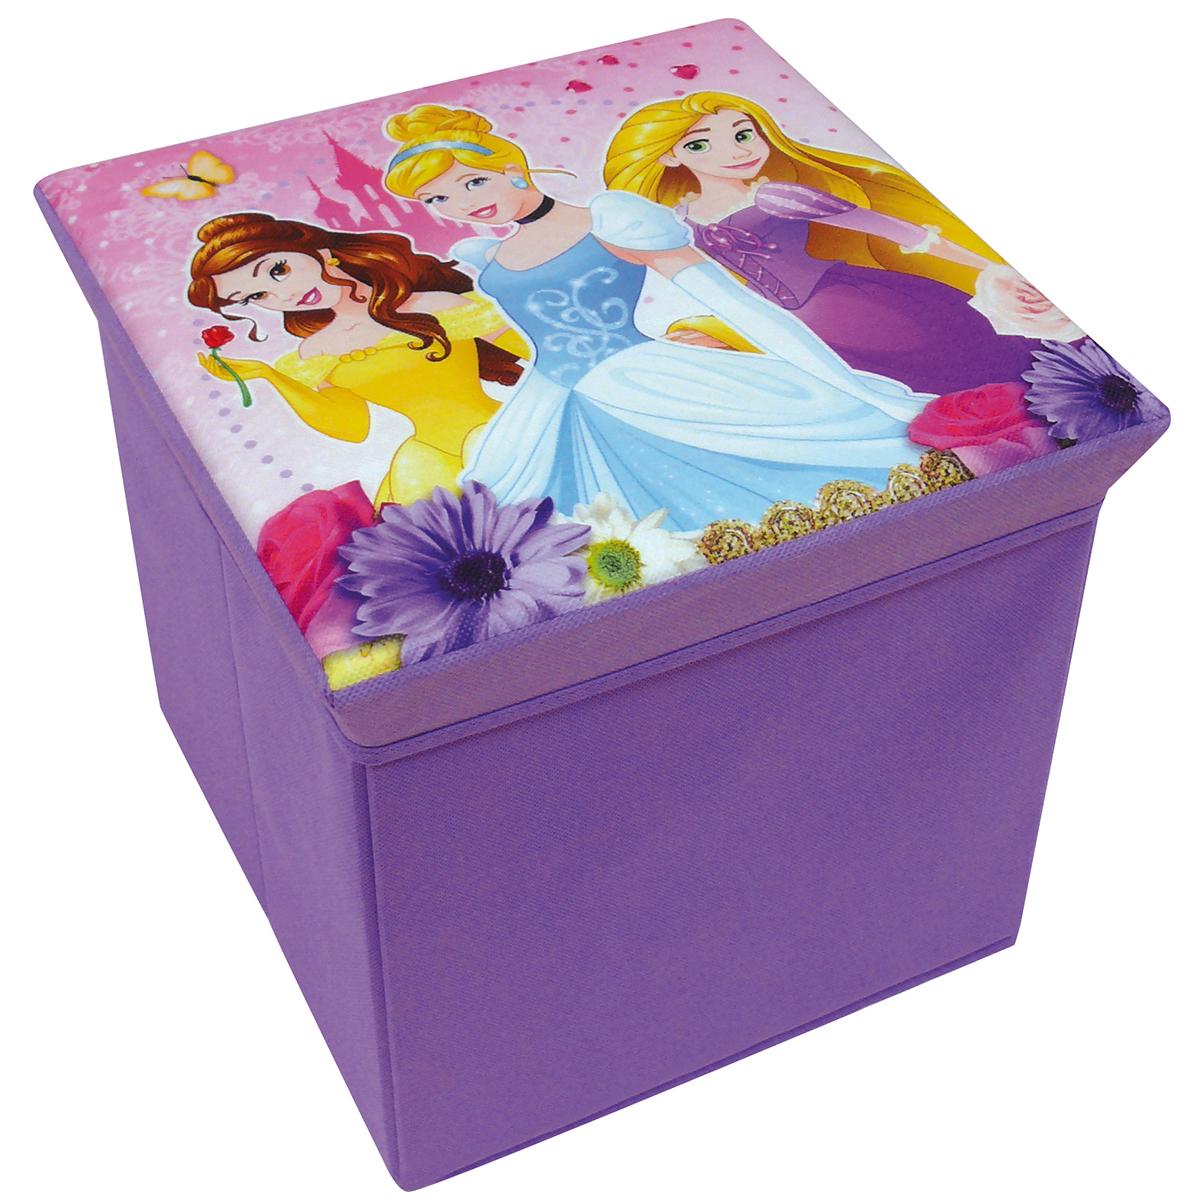 Disney Princess Toy box Stool Foldable 31 x 31 x 29 cm